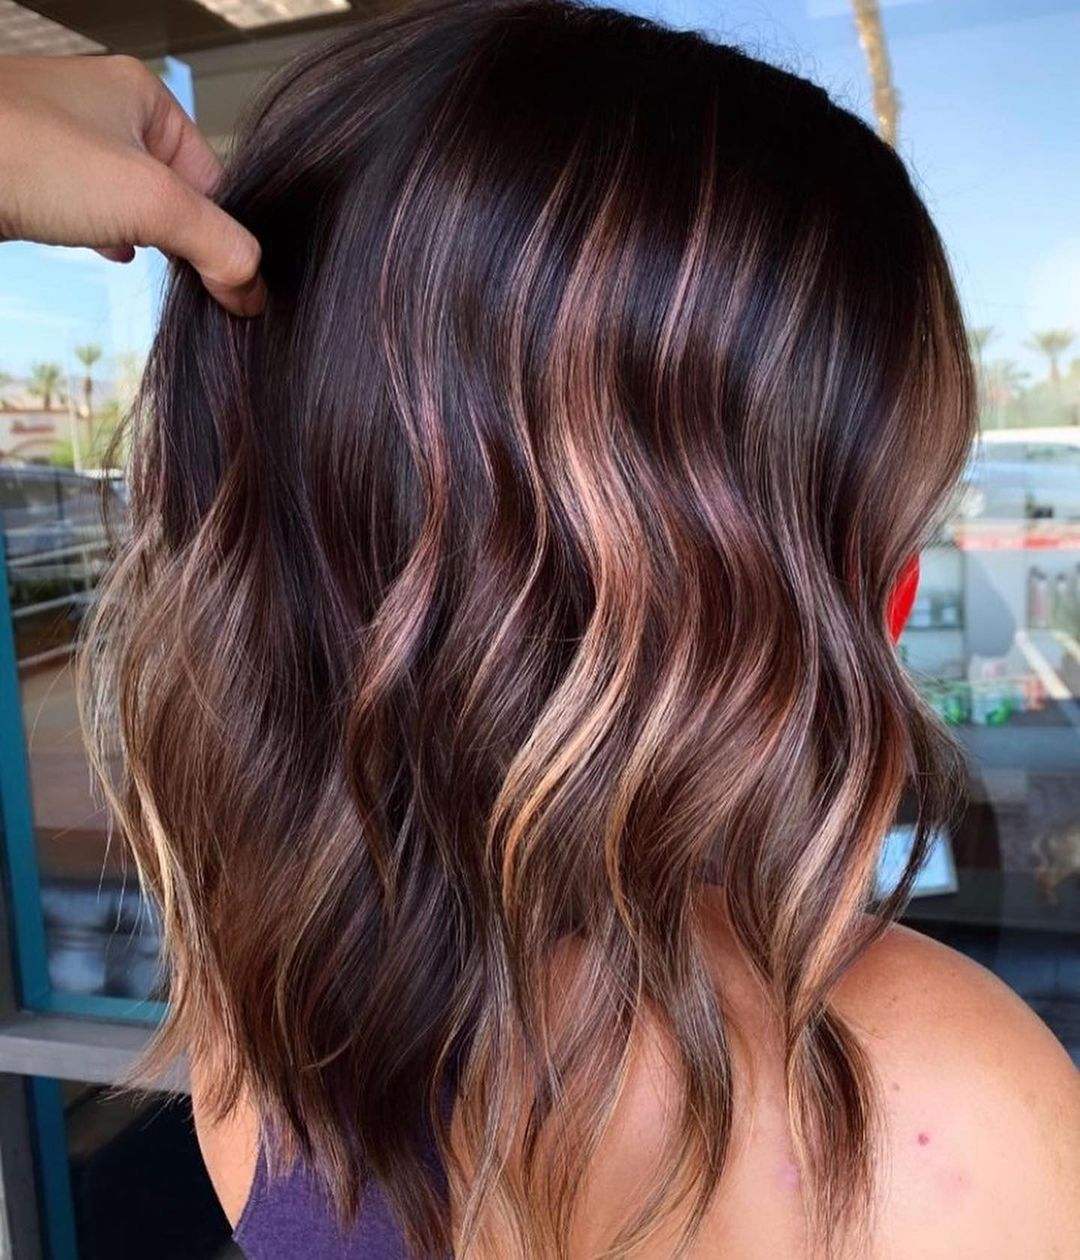 Dark Hair with Strawberry Blonde Highlights